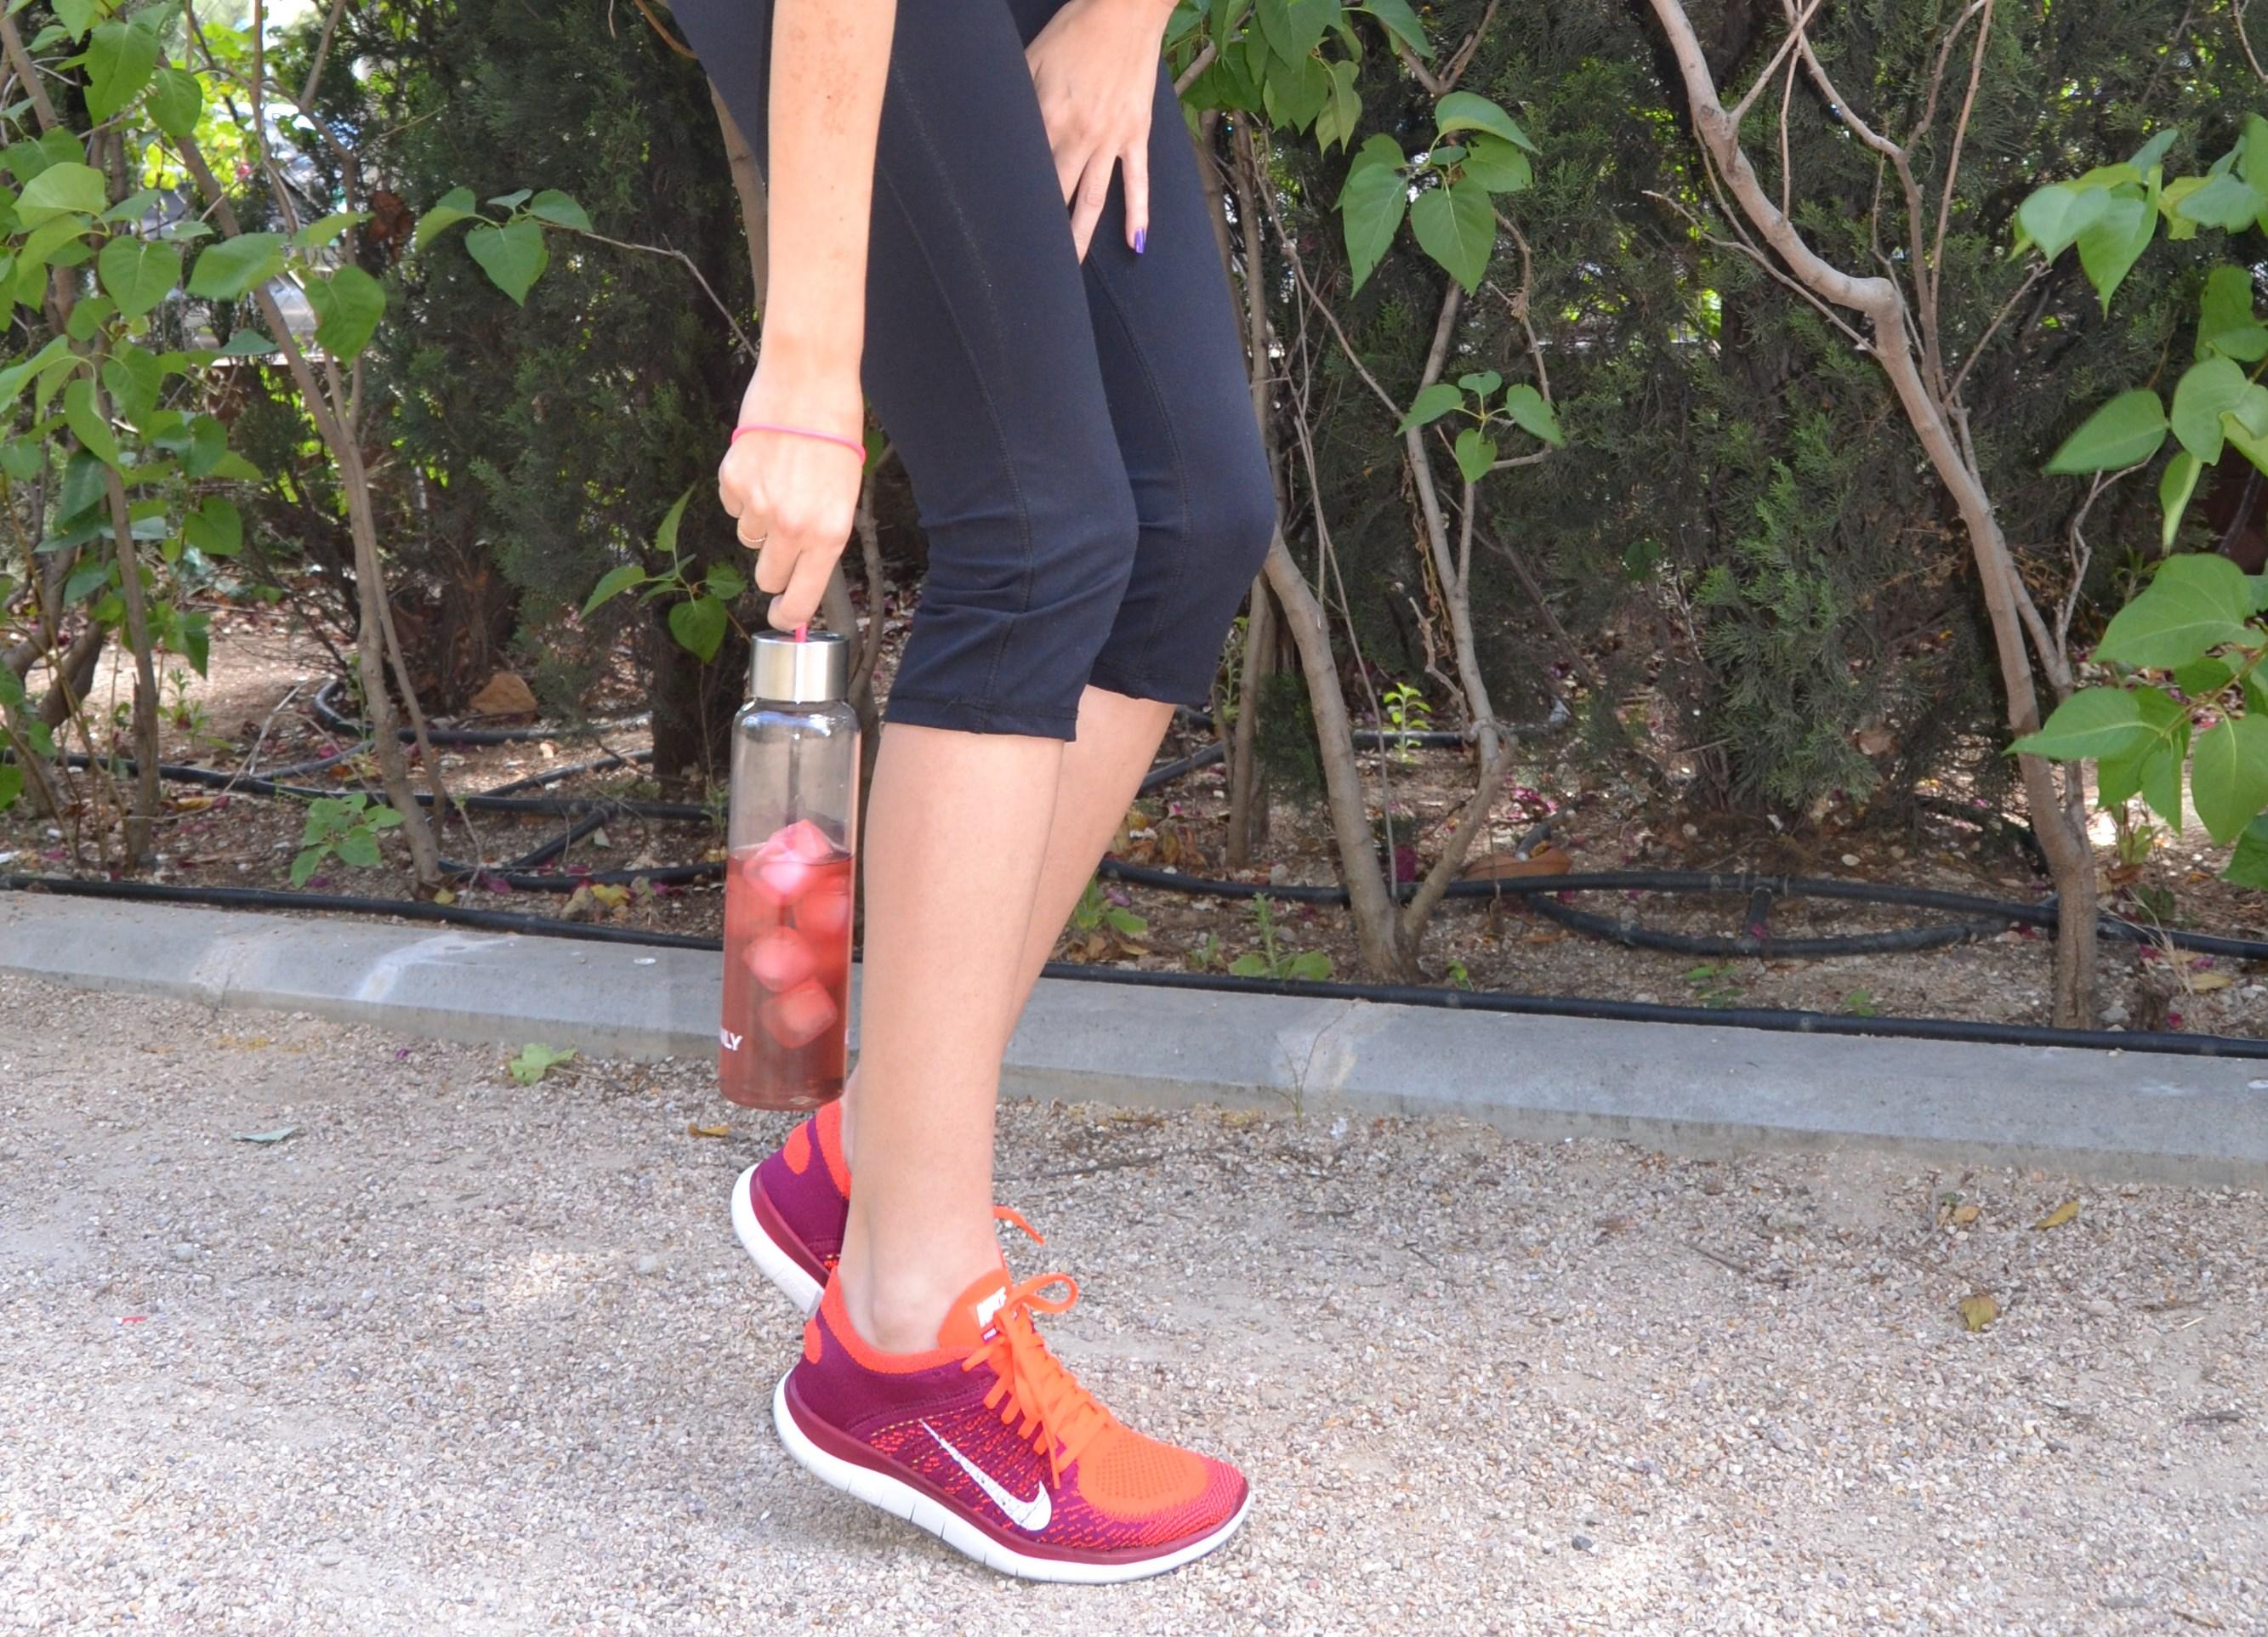 HerbaPremium_Healthy_Life_Sporty_Outfit_Fitness_Nike_Free_Flyknit_Mirror_Sunnies_Lara_Martin_Gilarranz_Bymyheels (15)